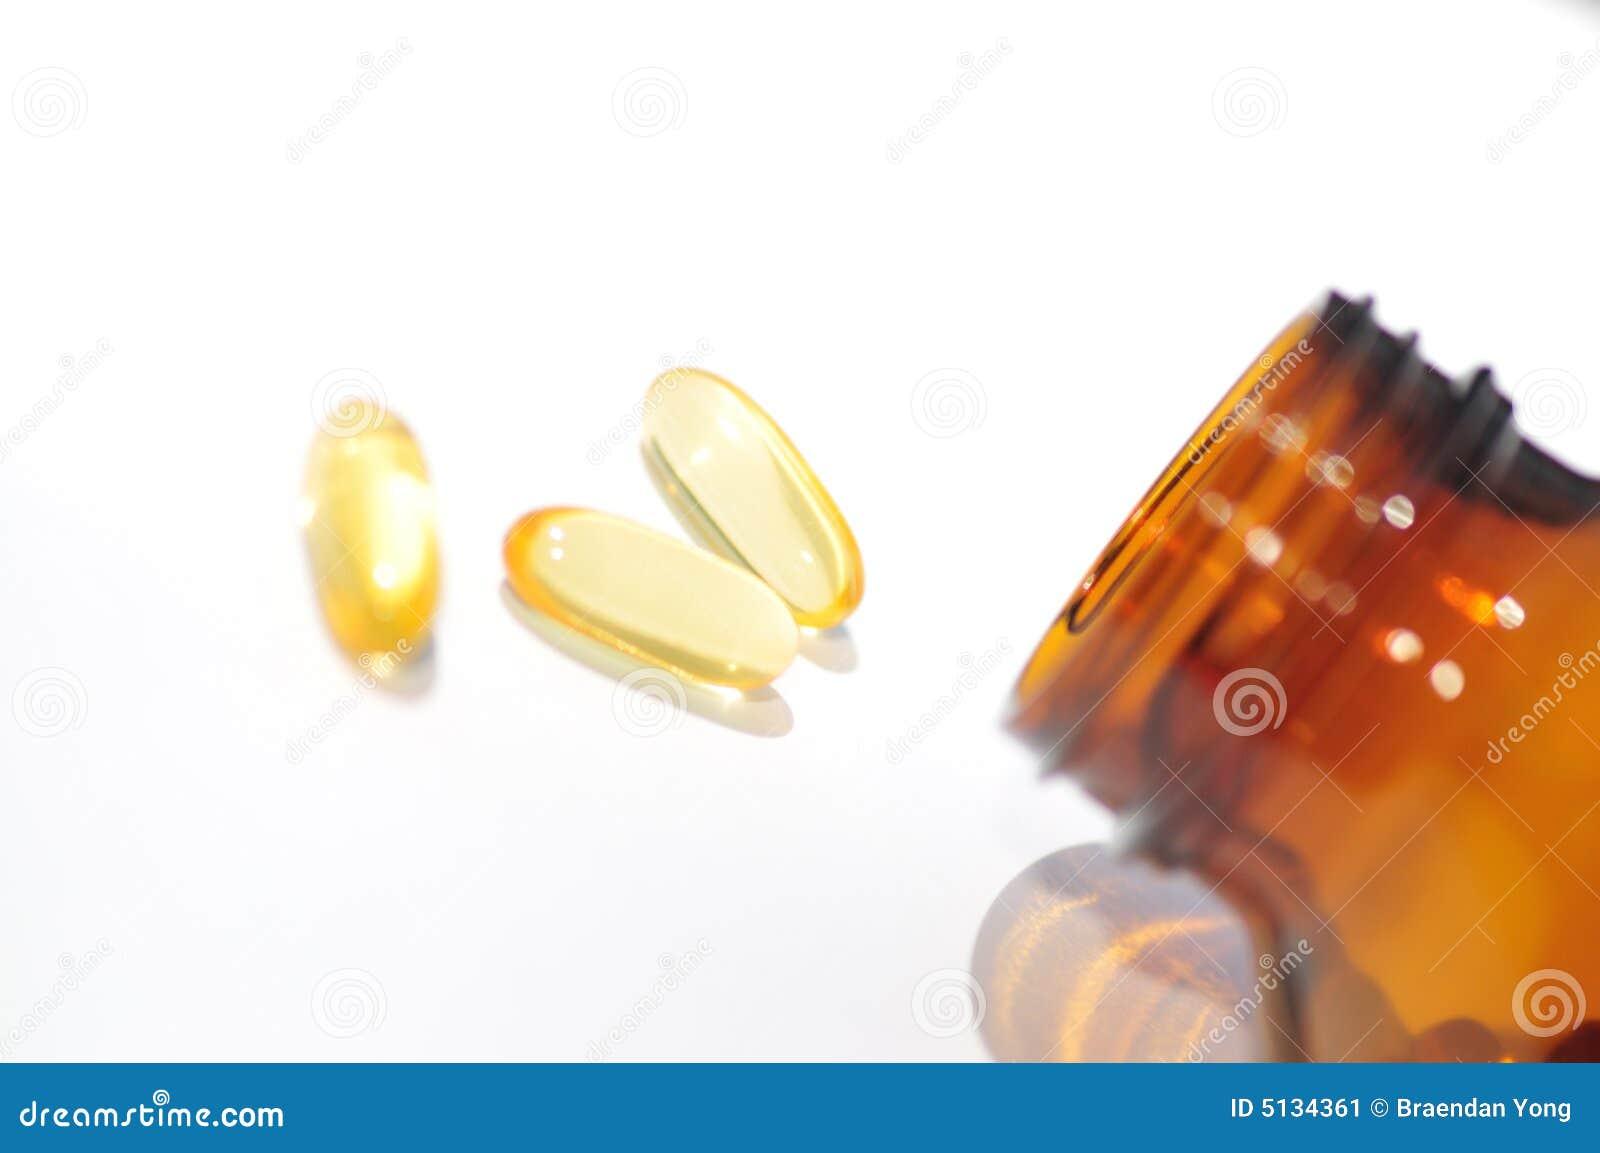 Fish Oil Supplements II Stock Image - Image: 5134361